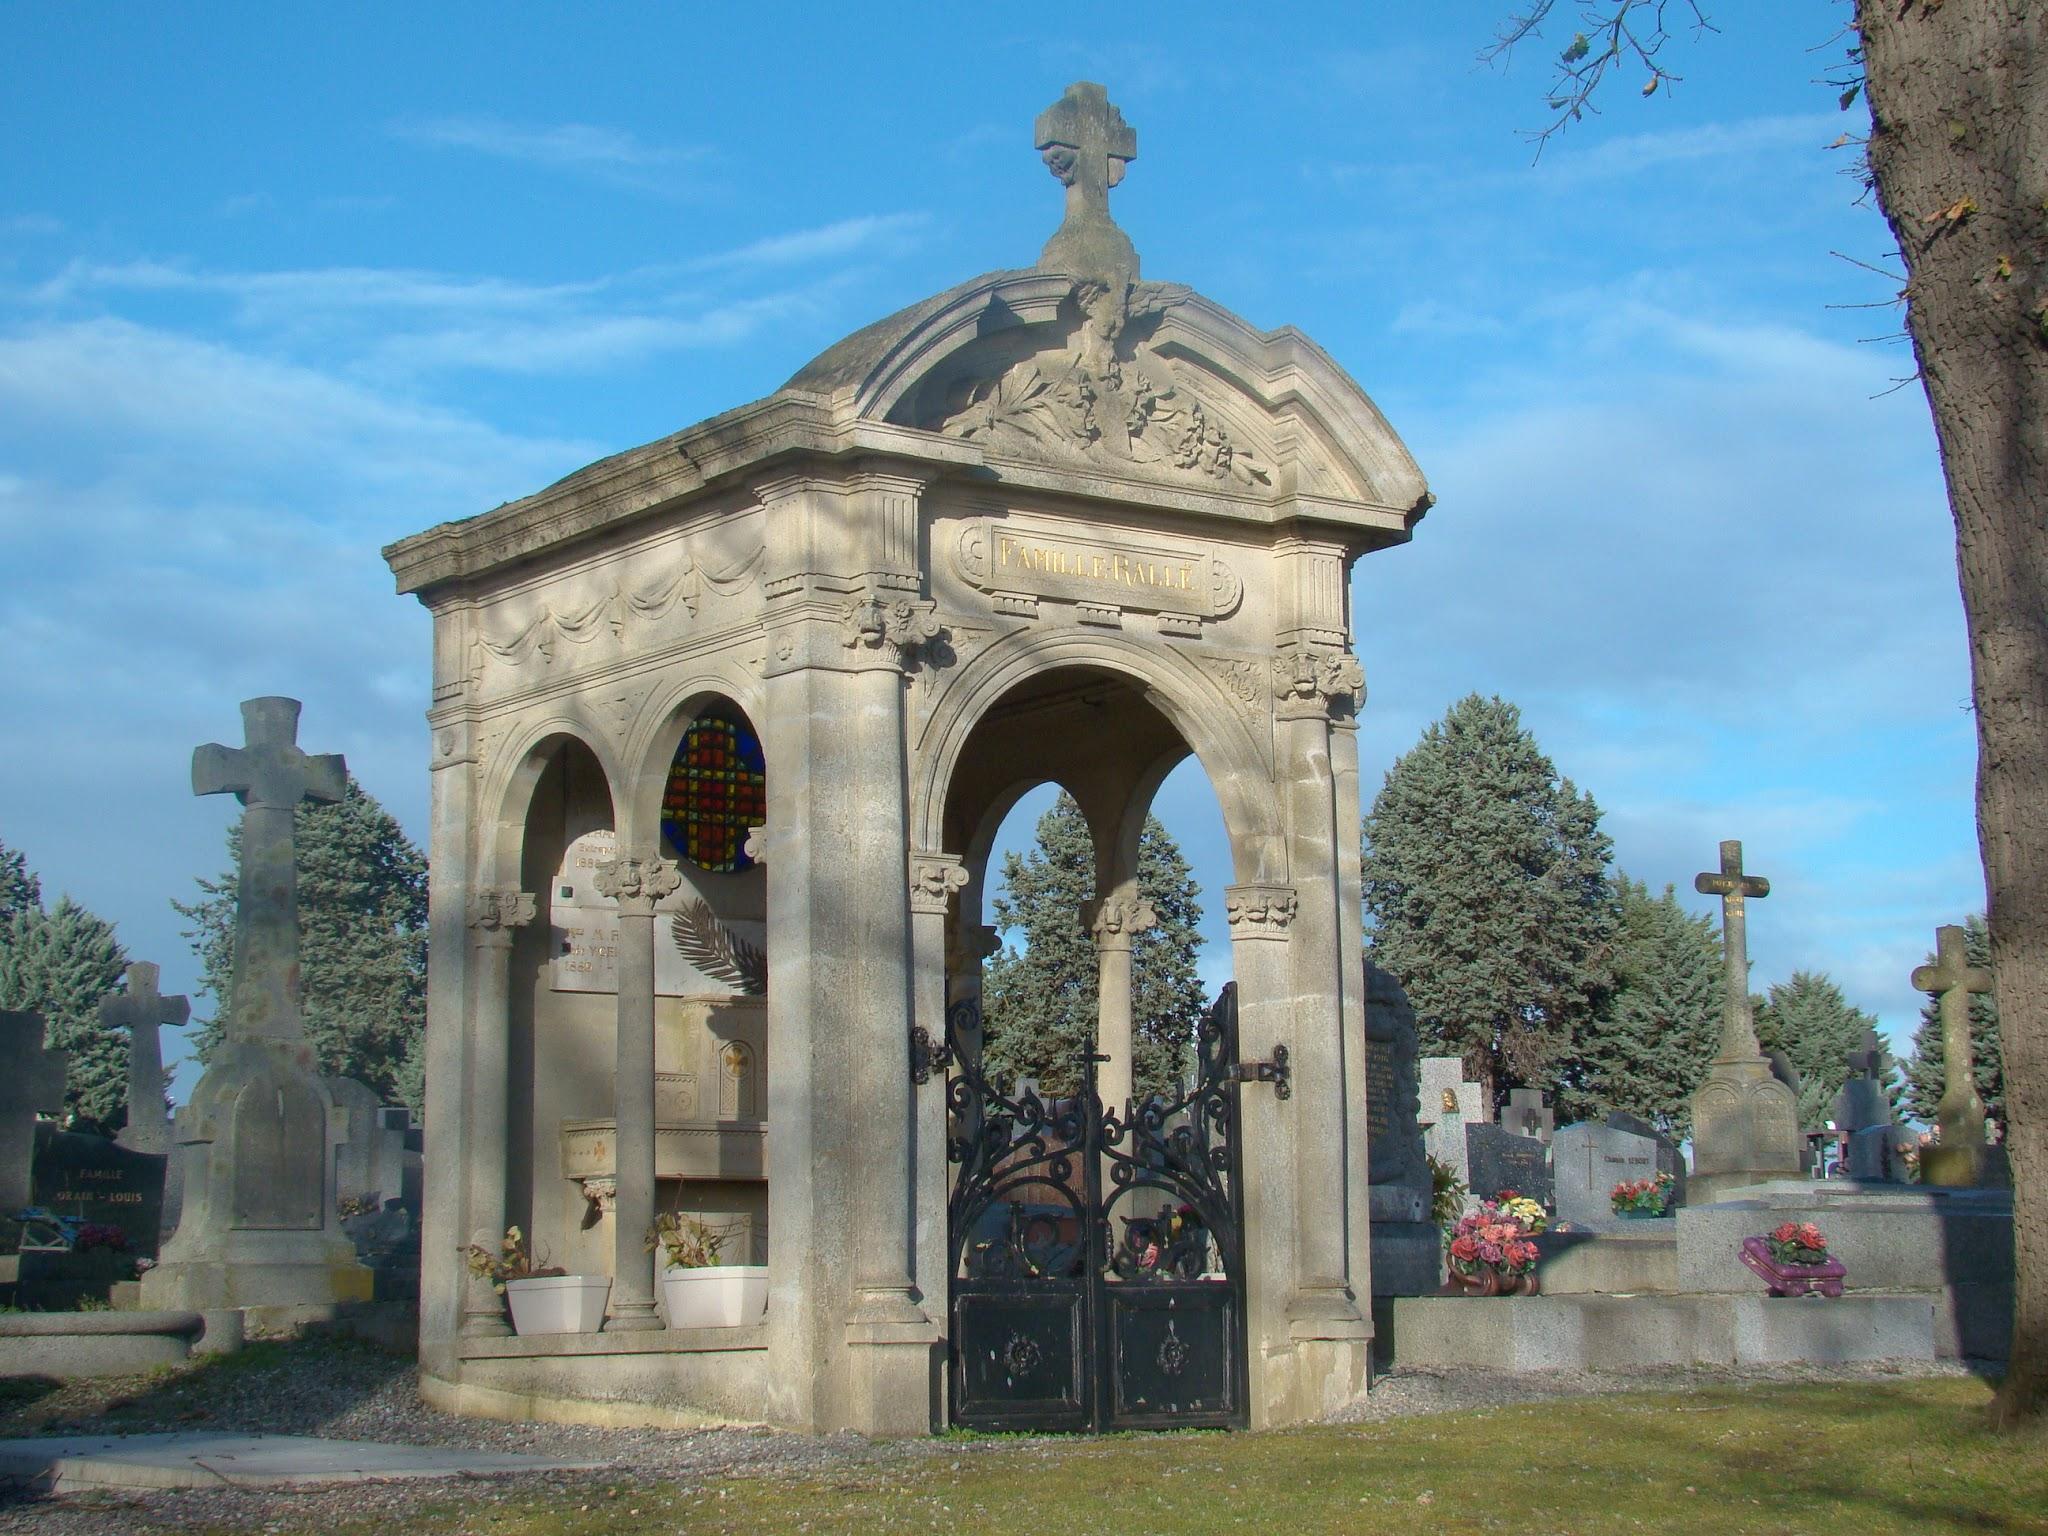 Eastern Cemetery (Rennes, France)